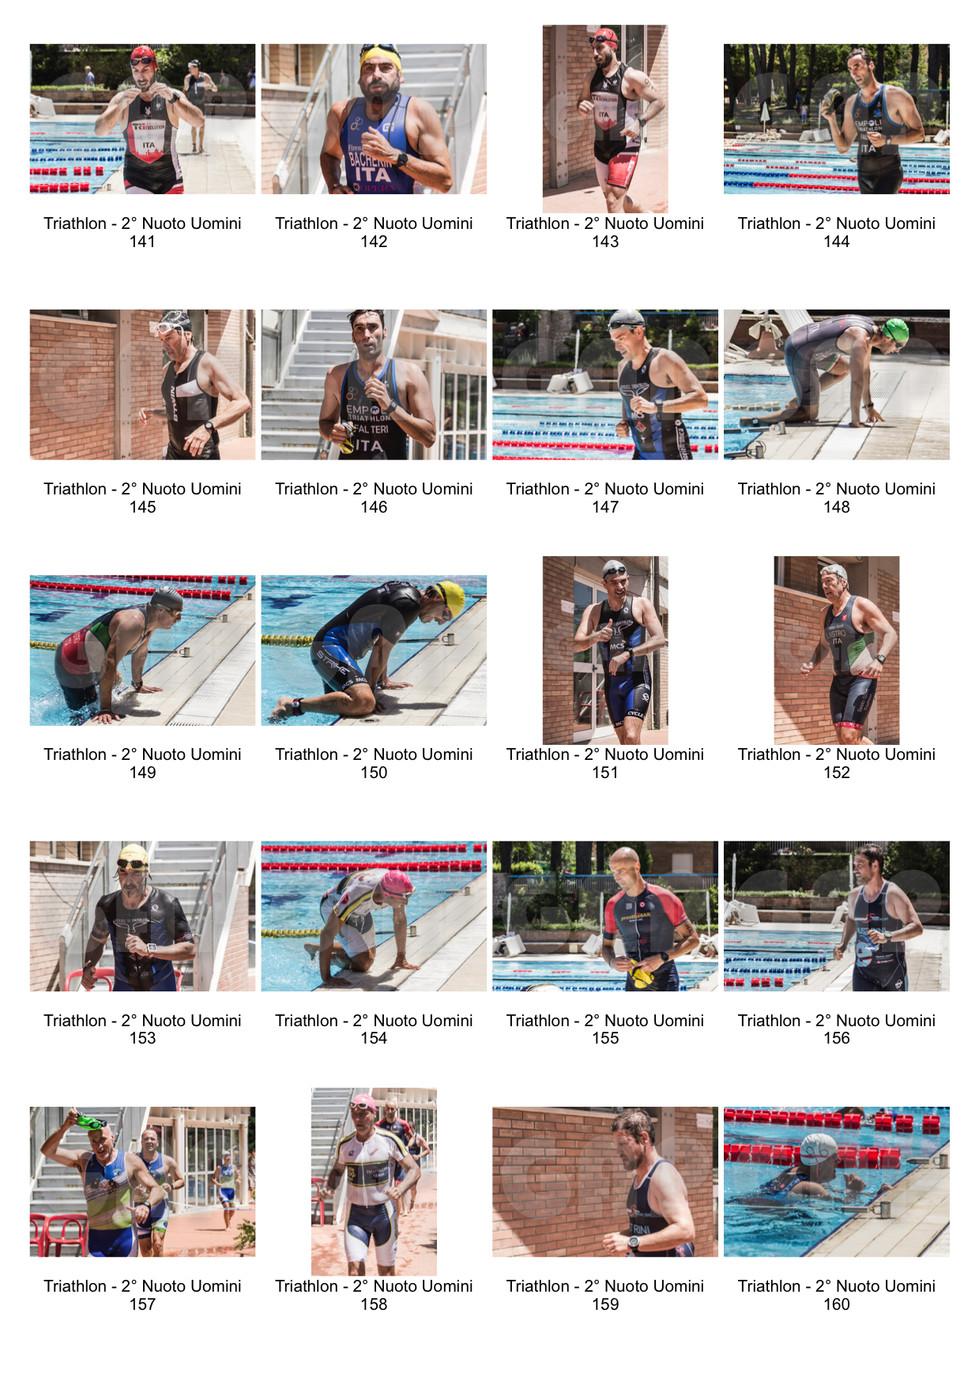 Triathlon_V.Elsa_-_2°_Frazione_Nuoto_Uomini_-8.jpg